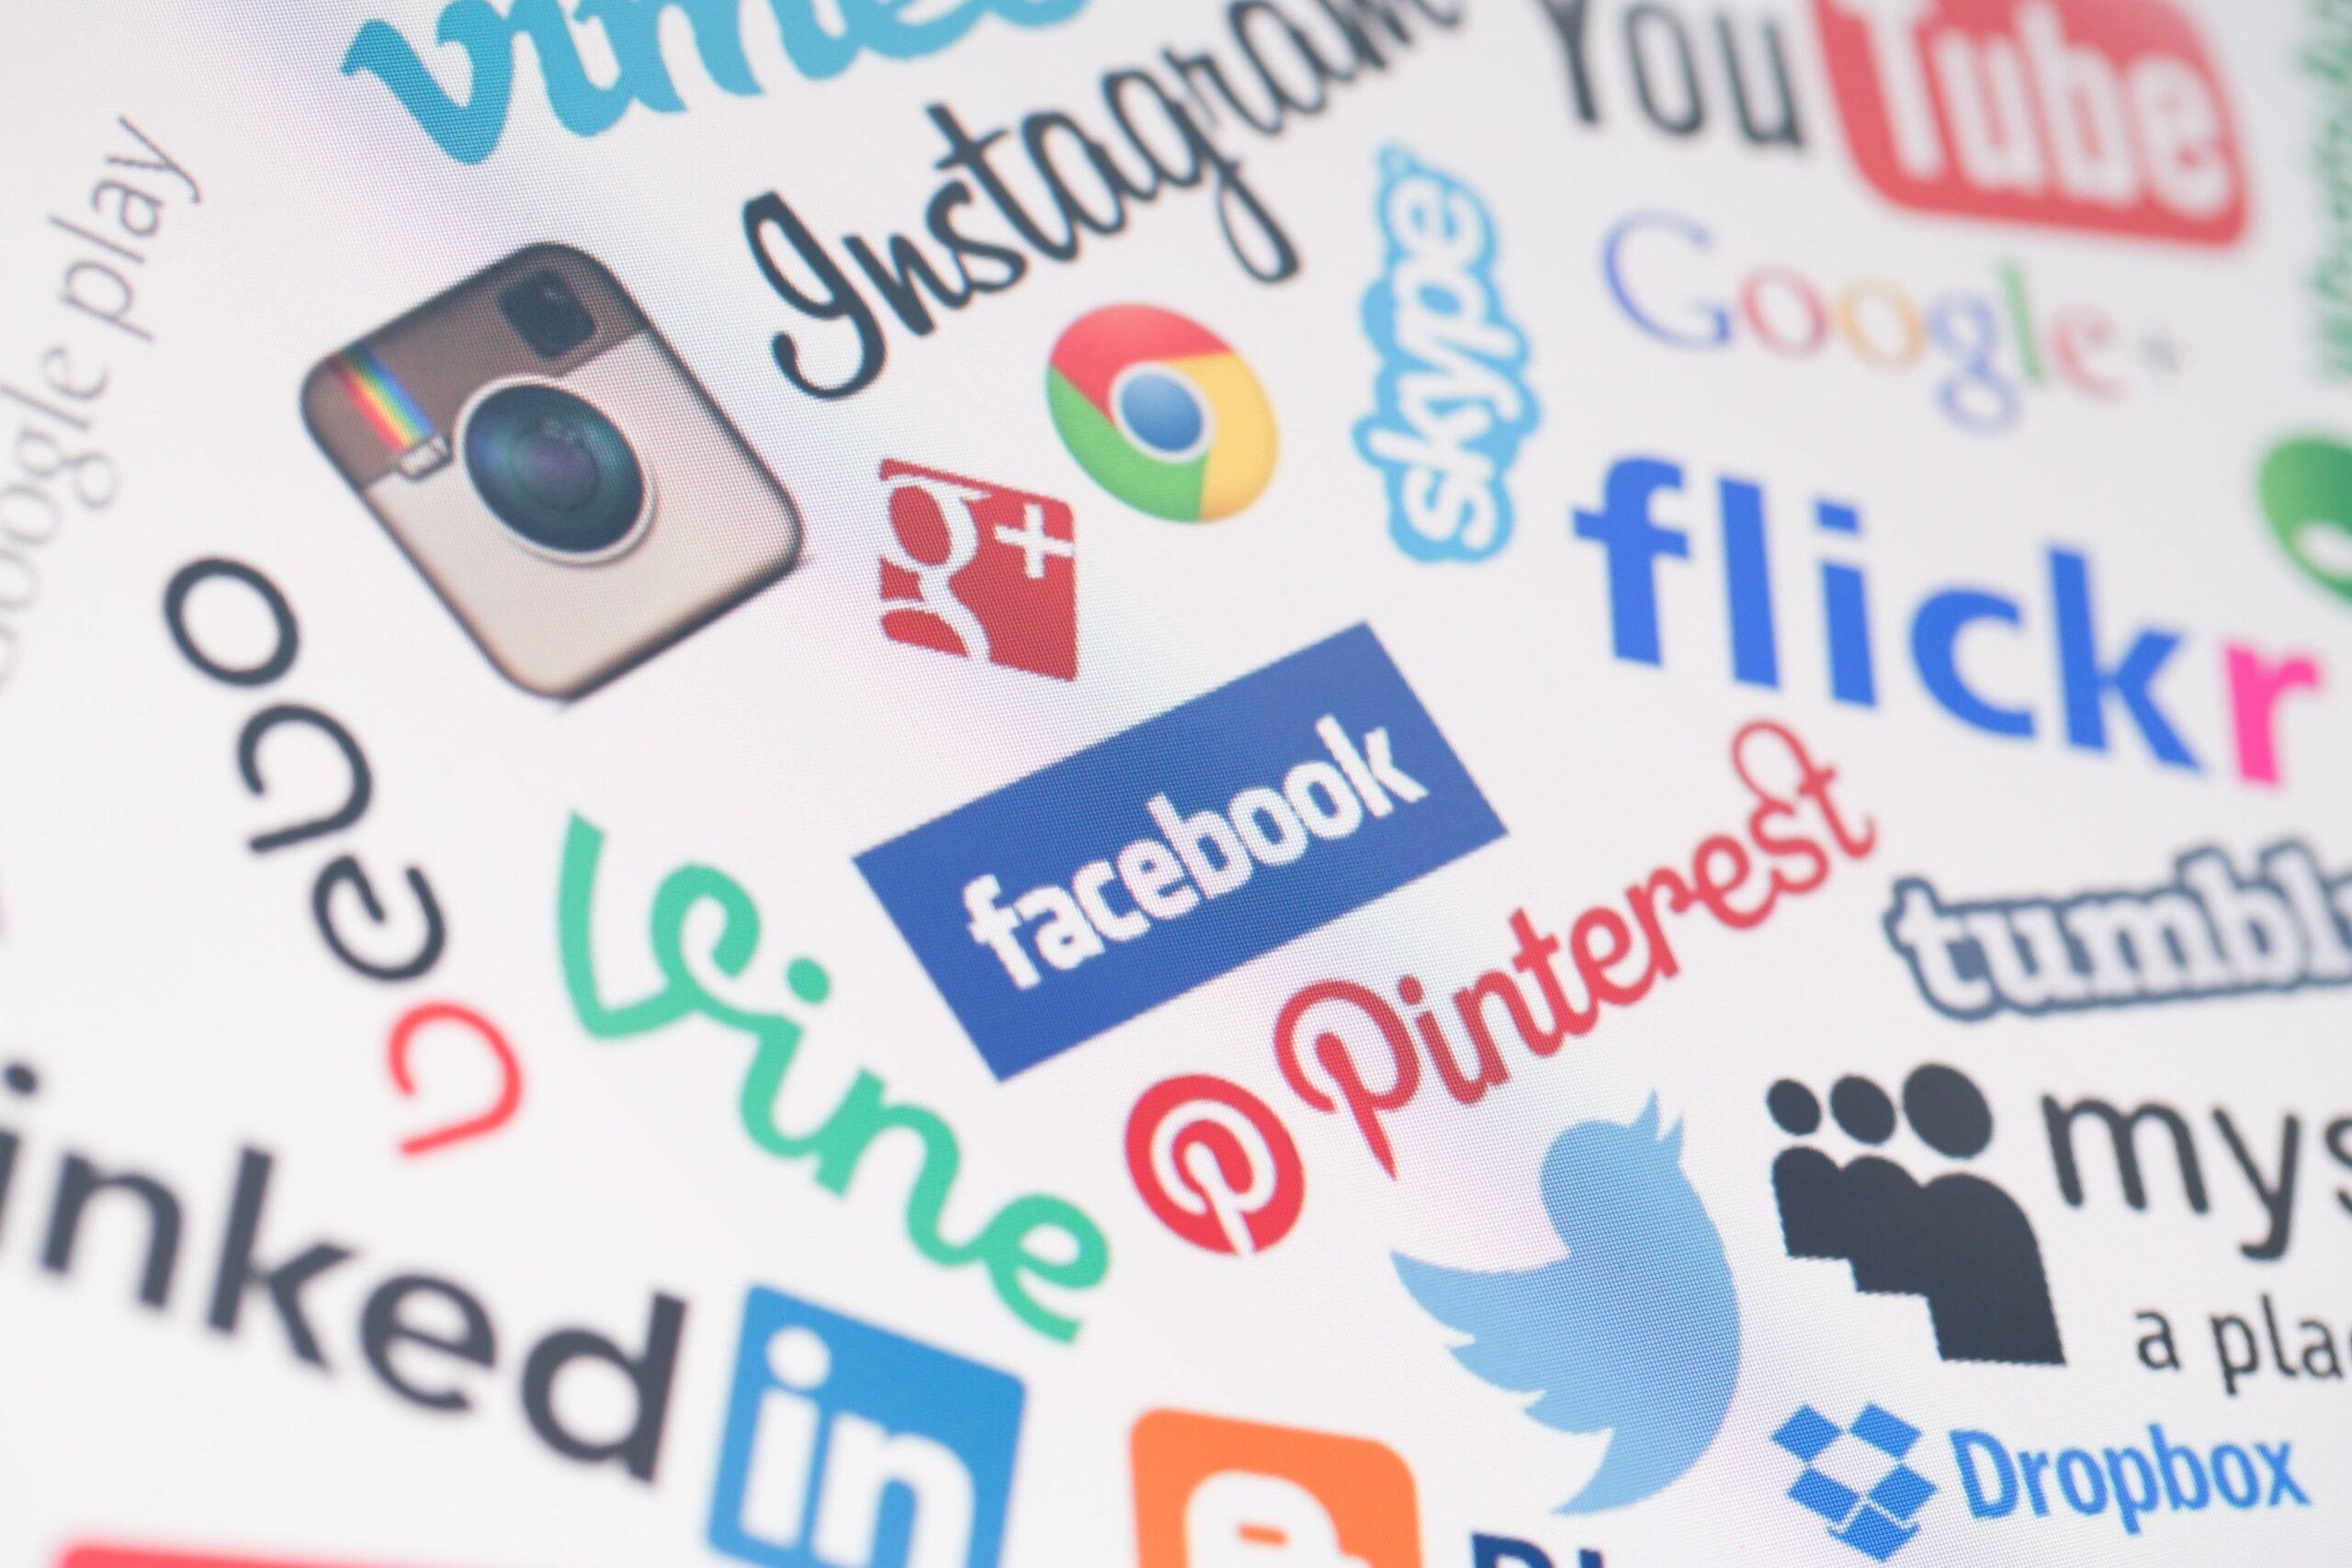 social media platforms, ways to marketing your school